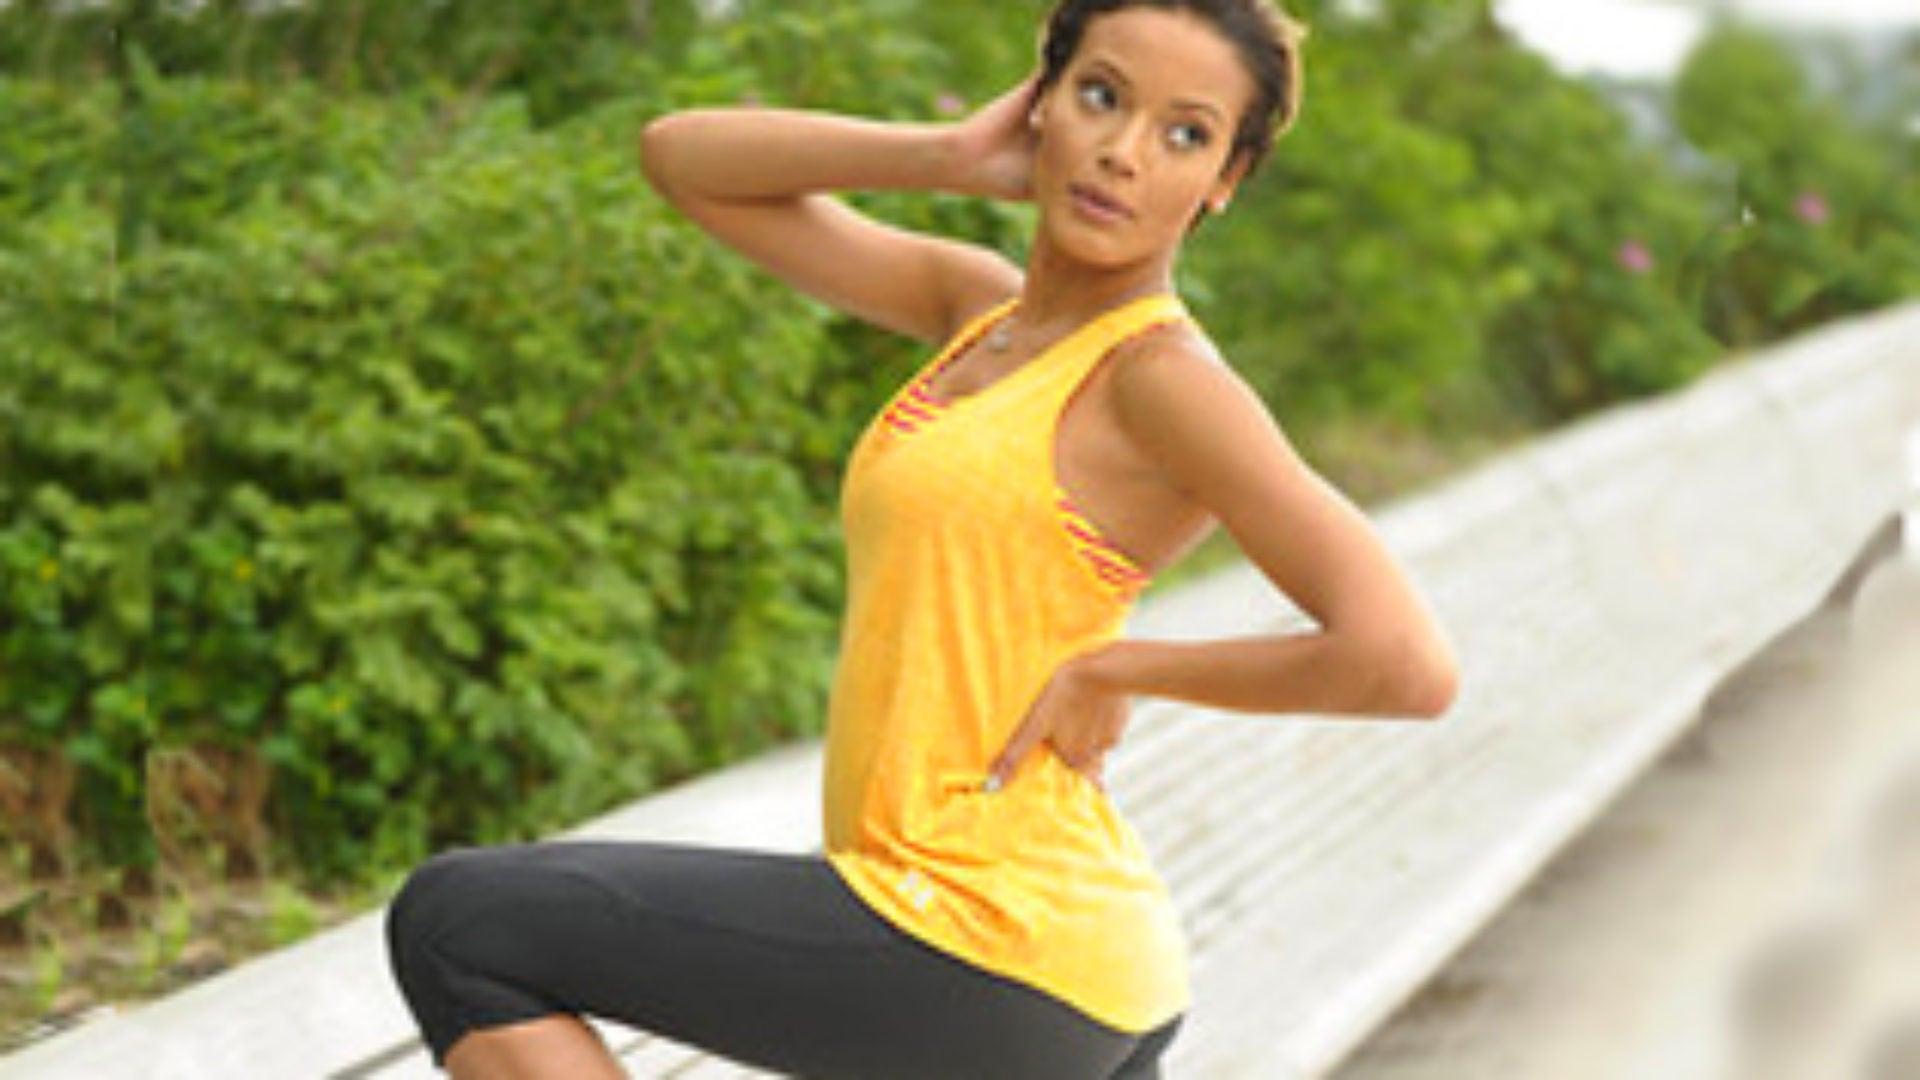 Celeb Style: Workout Wear